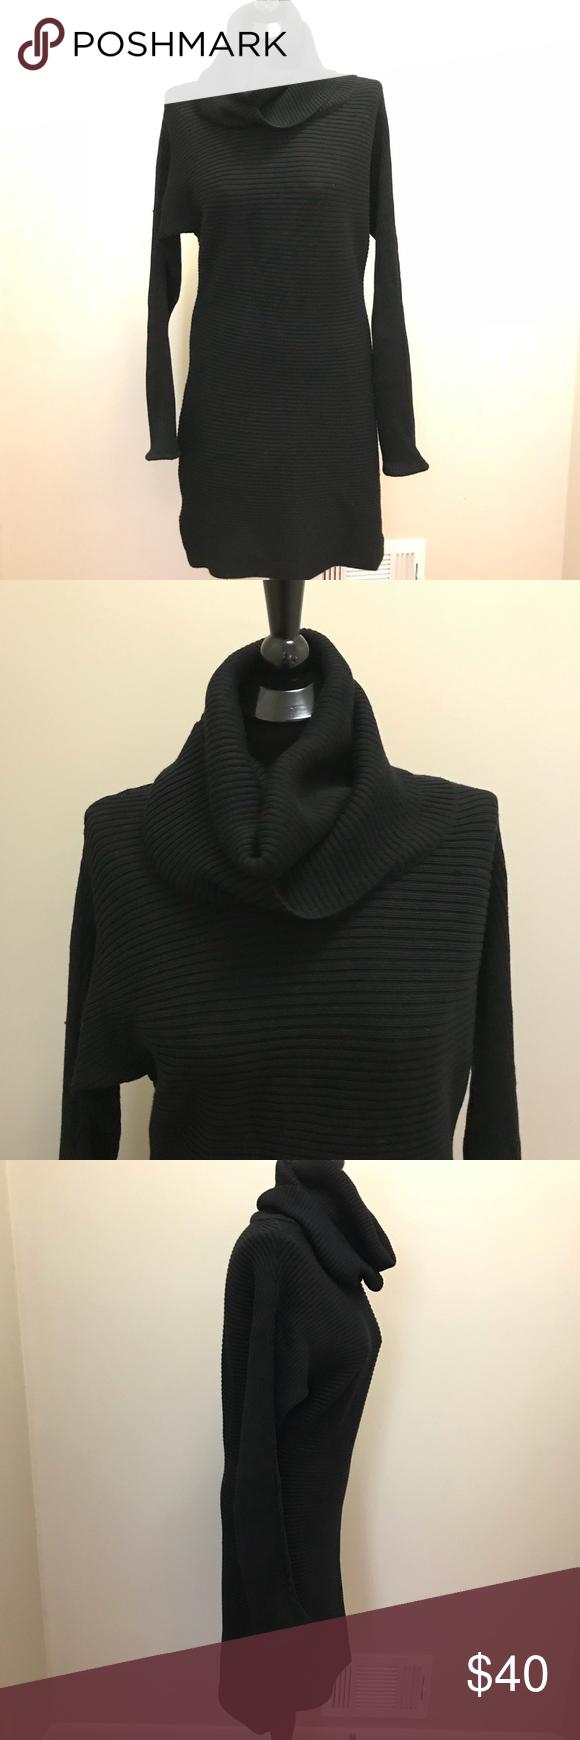 Black longsleeve sweater dress pinterest